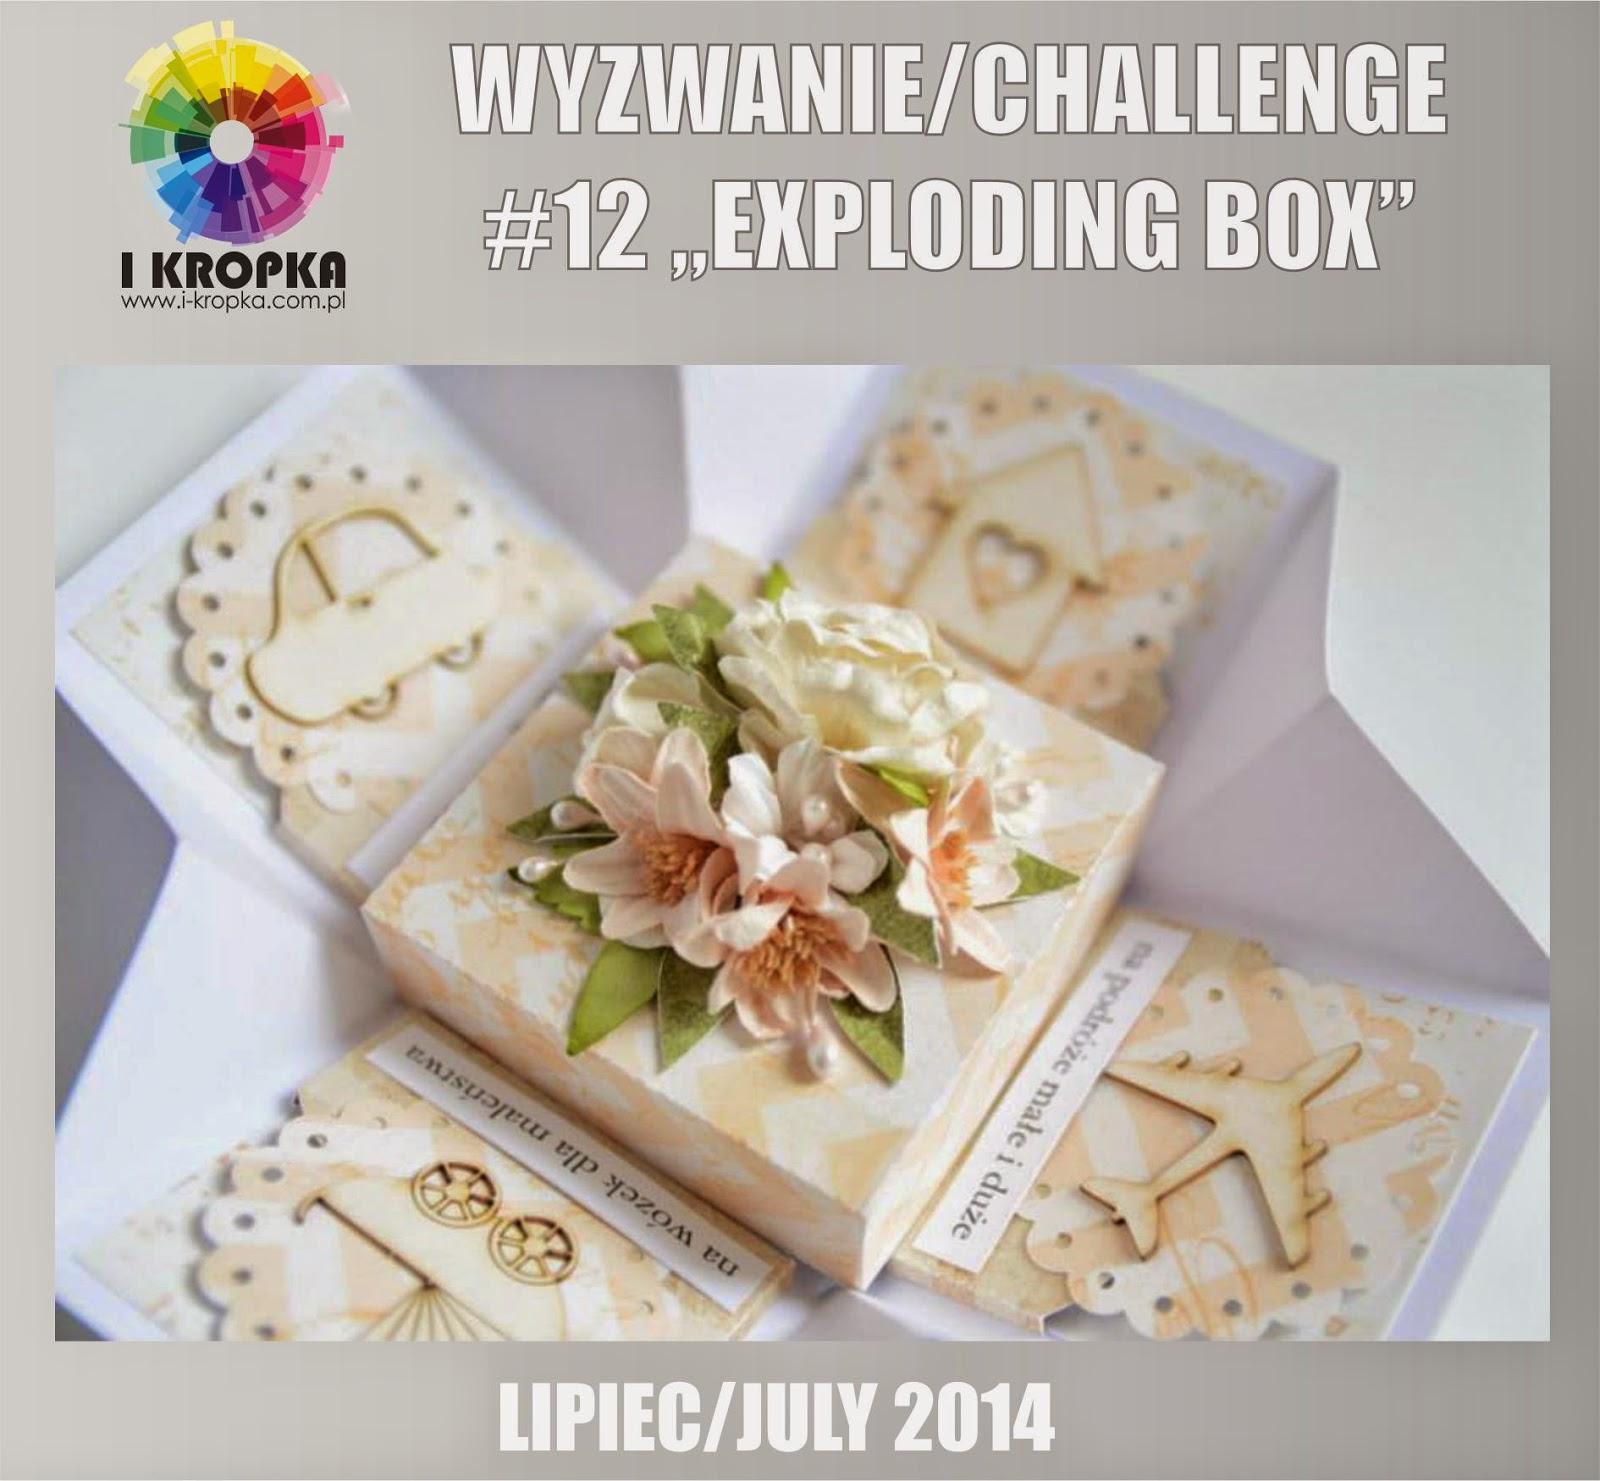 http://pracownia-i-kropka.blogspot.ie/2014/07/wyzwaniechallenge-12-exploding-box.html